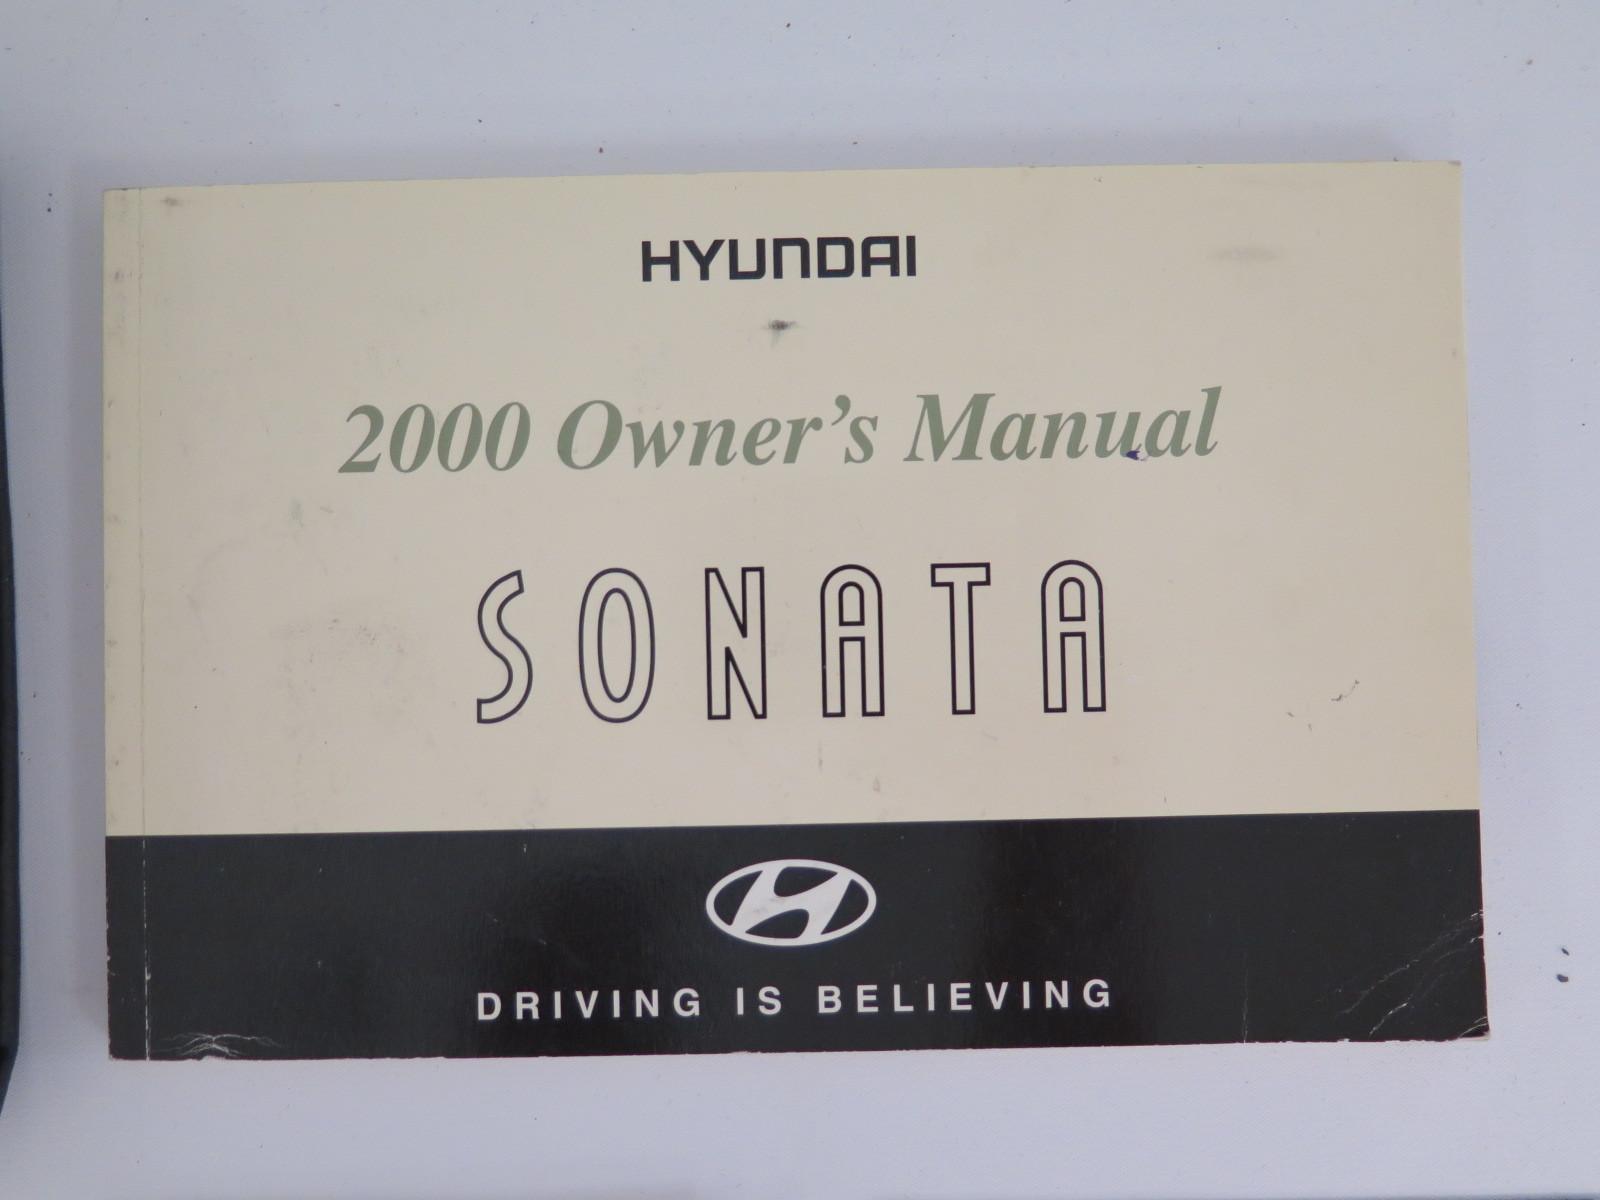 2000 hyundai sonata owners manual book bashful yak rh bashfulyak com 2000 hyundai sonata repair manual Hyundai Sonata Manual Transmission